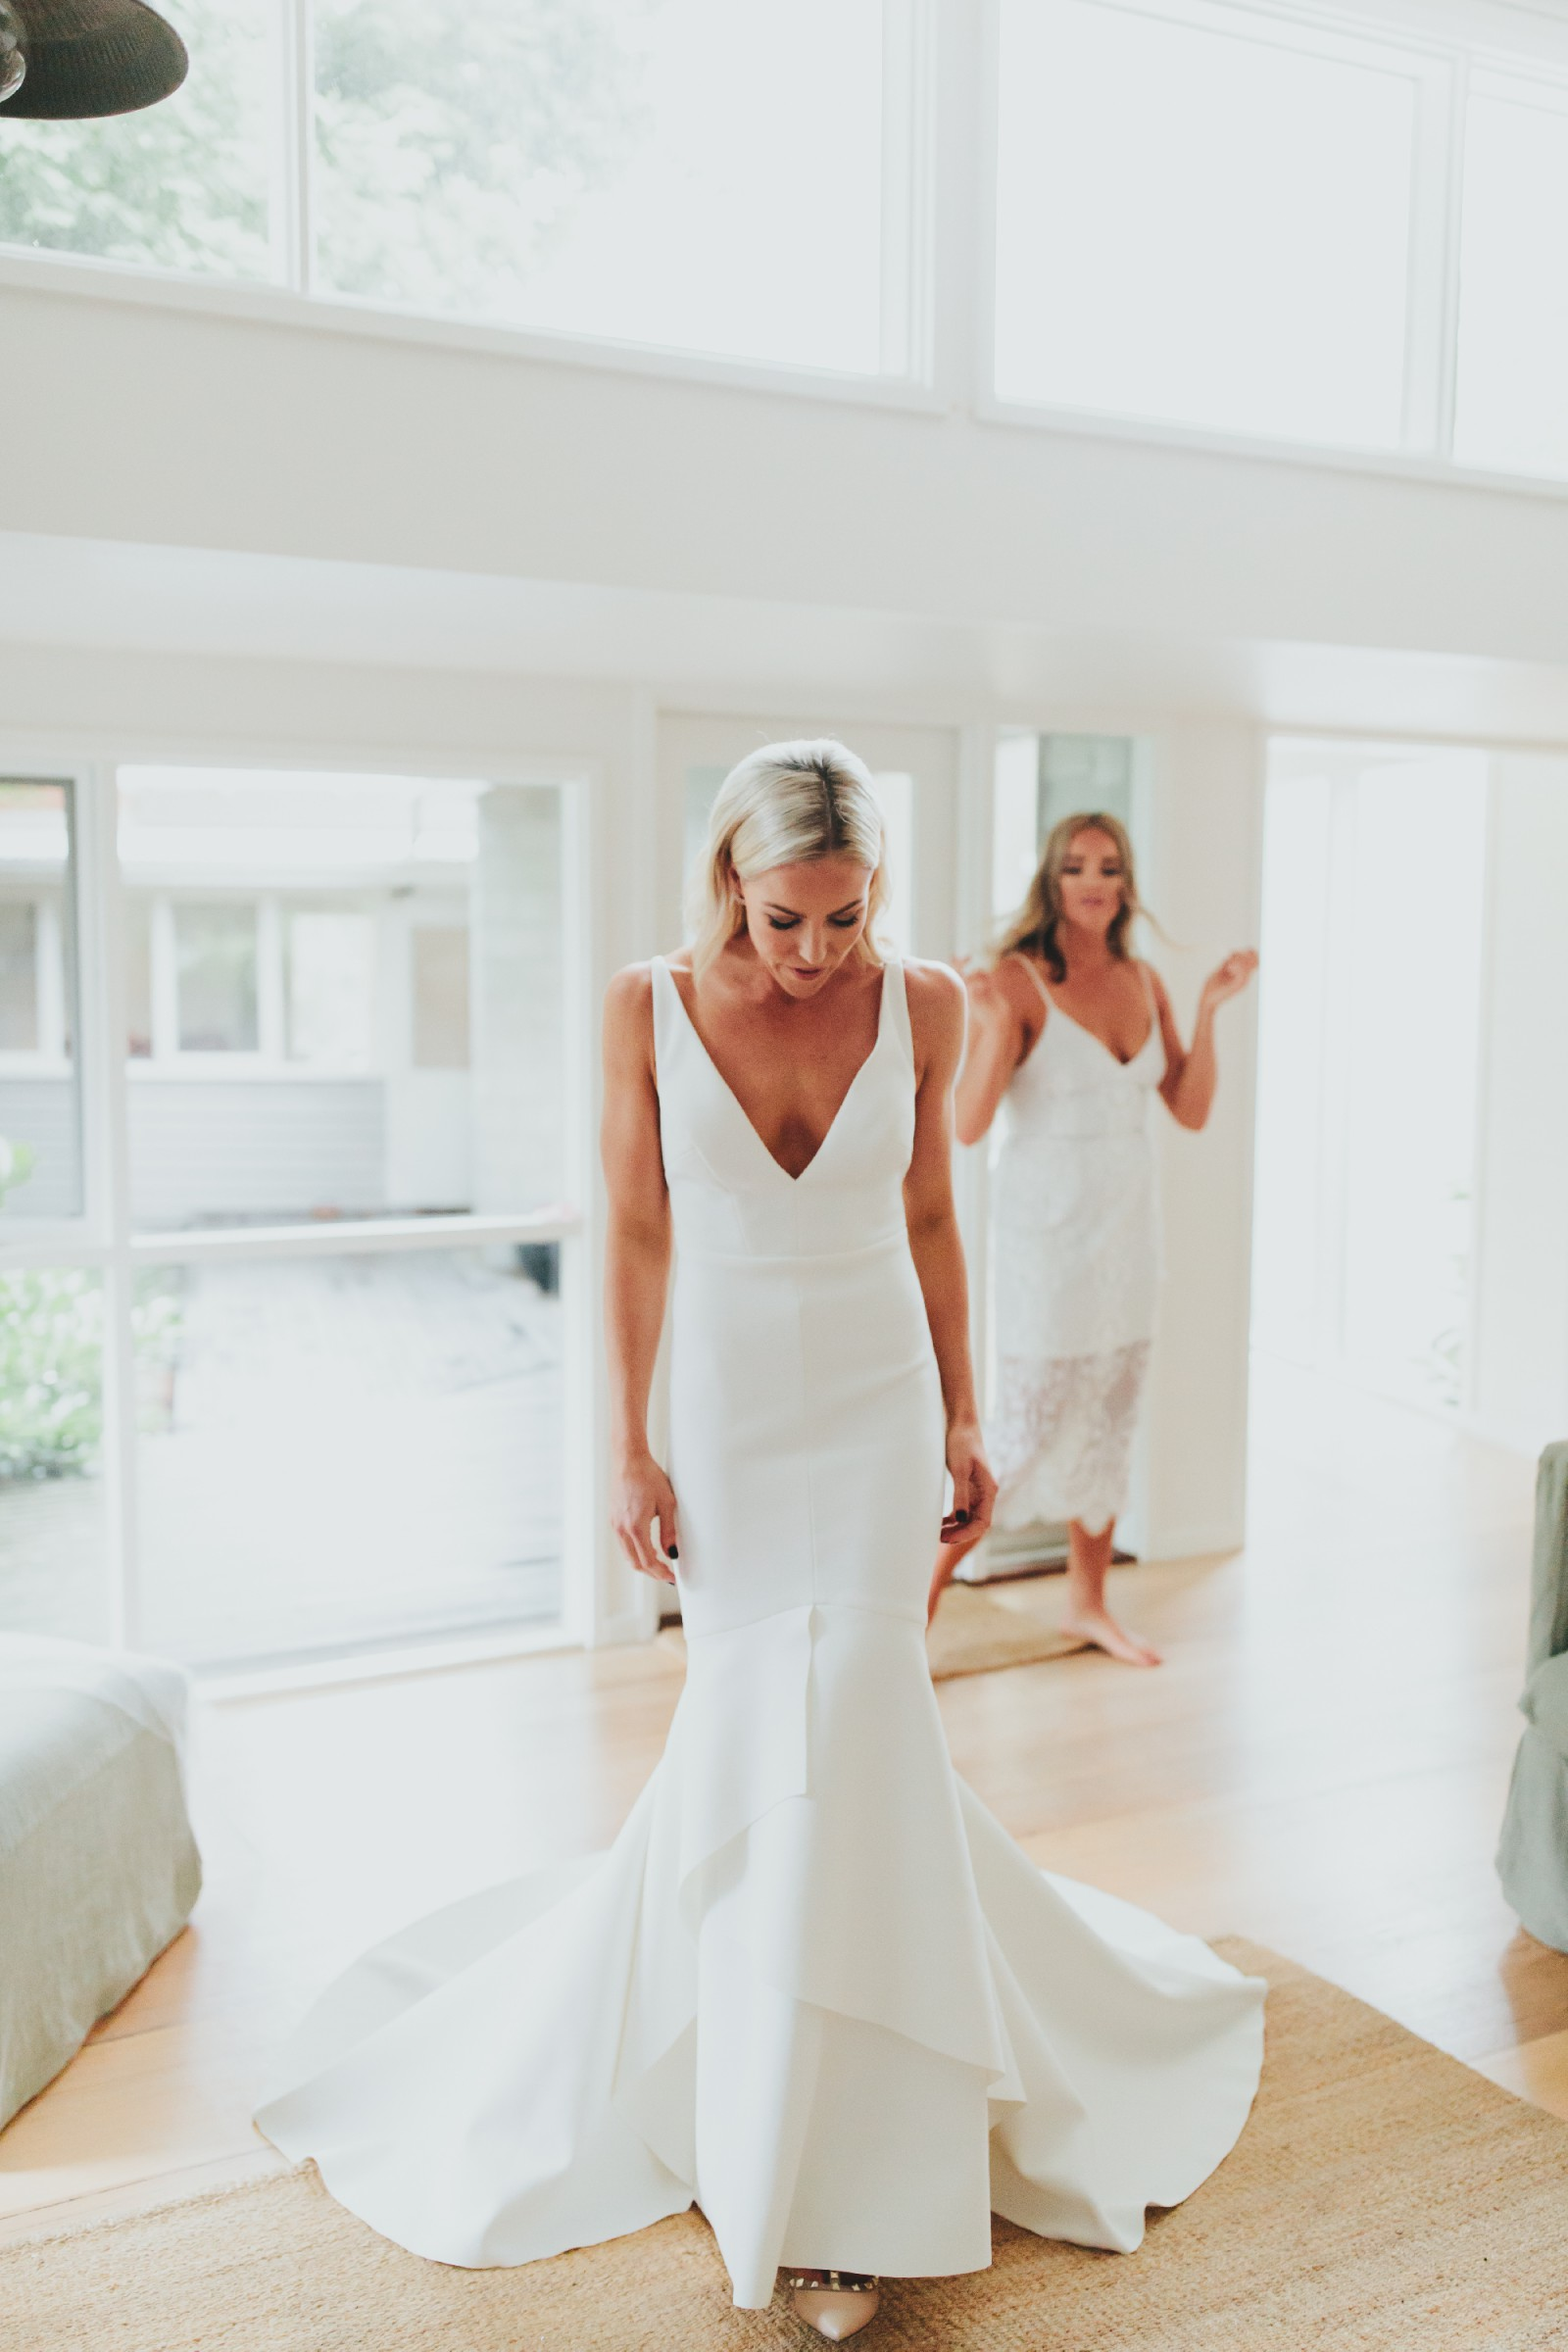 One Day Bridal Kingston Gown - Used Wedding Dresses - Stillwhite